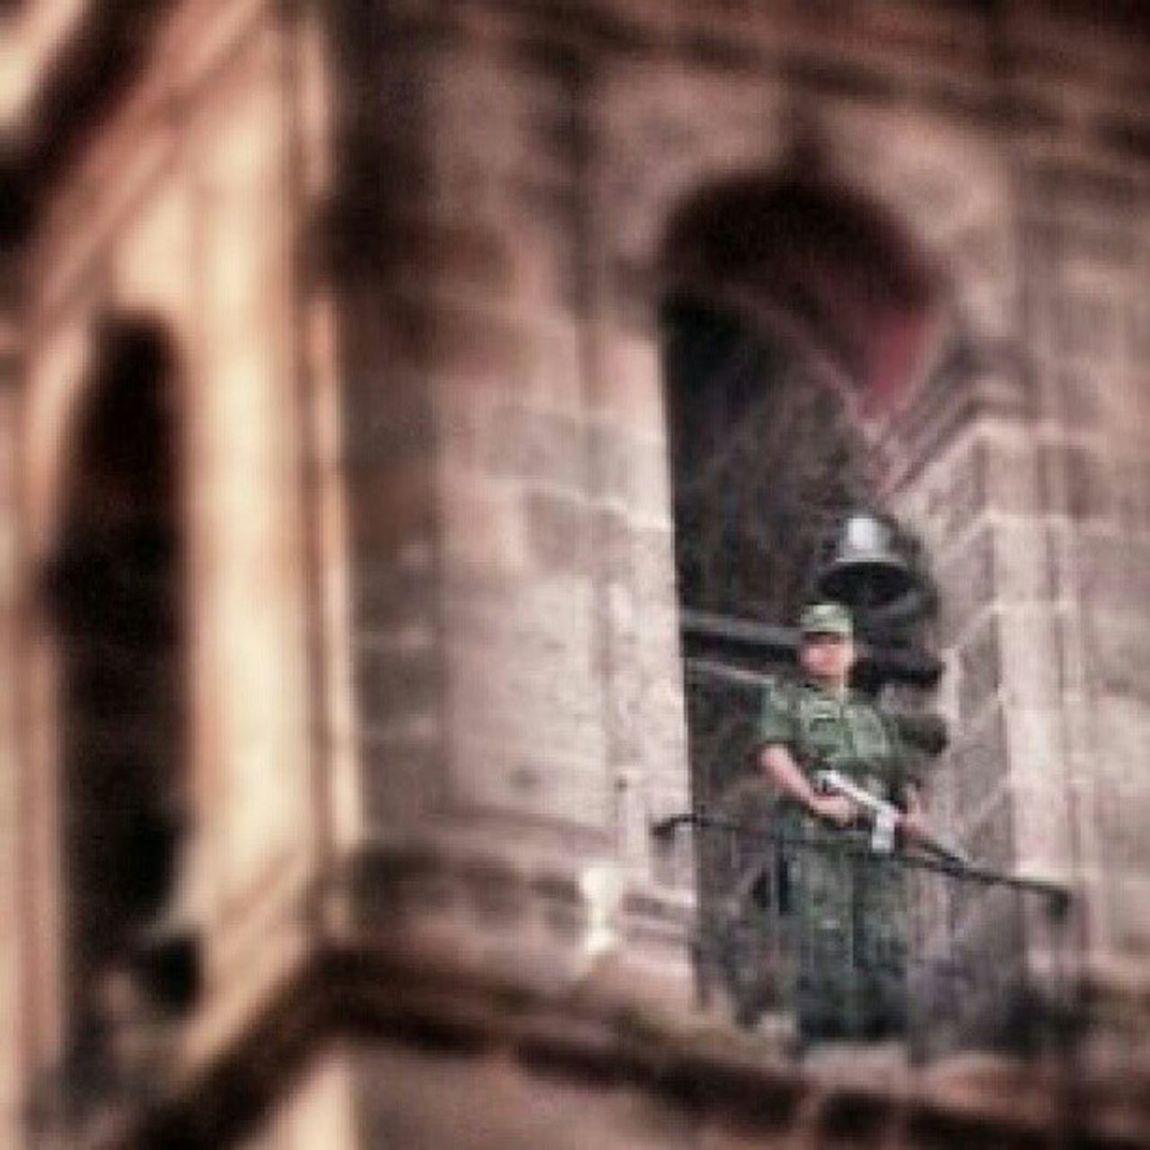 Hunting narcos Mexico SEDENA Army Instagram webstagram bestphoto picoftheday pictureoftheday igermexico